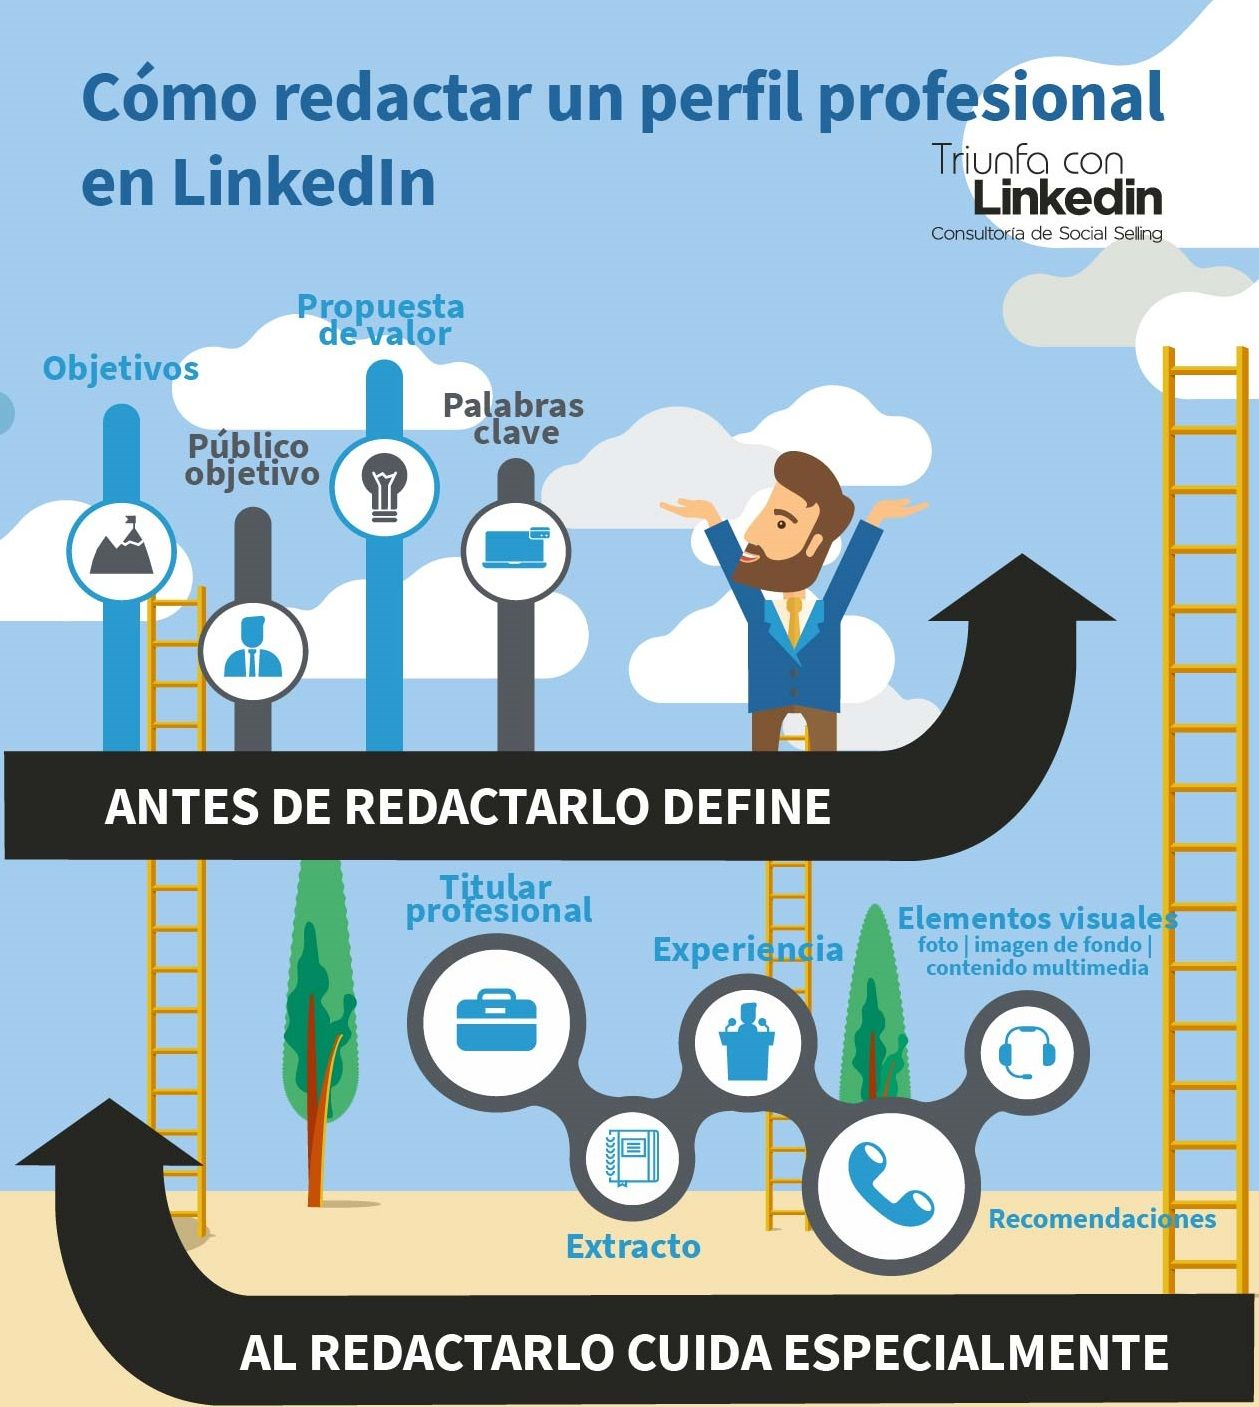 Cómo redactar un perfil profesional en LinkedIn - Infografía